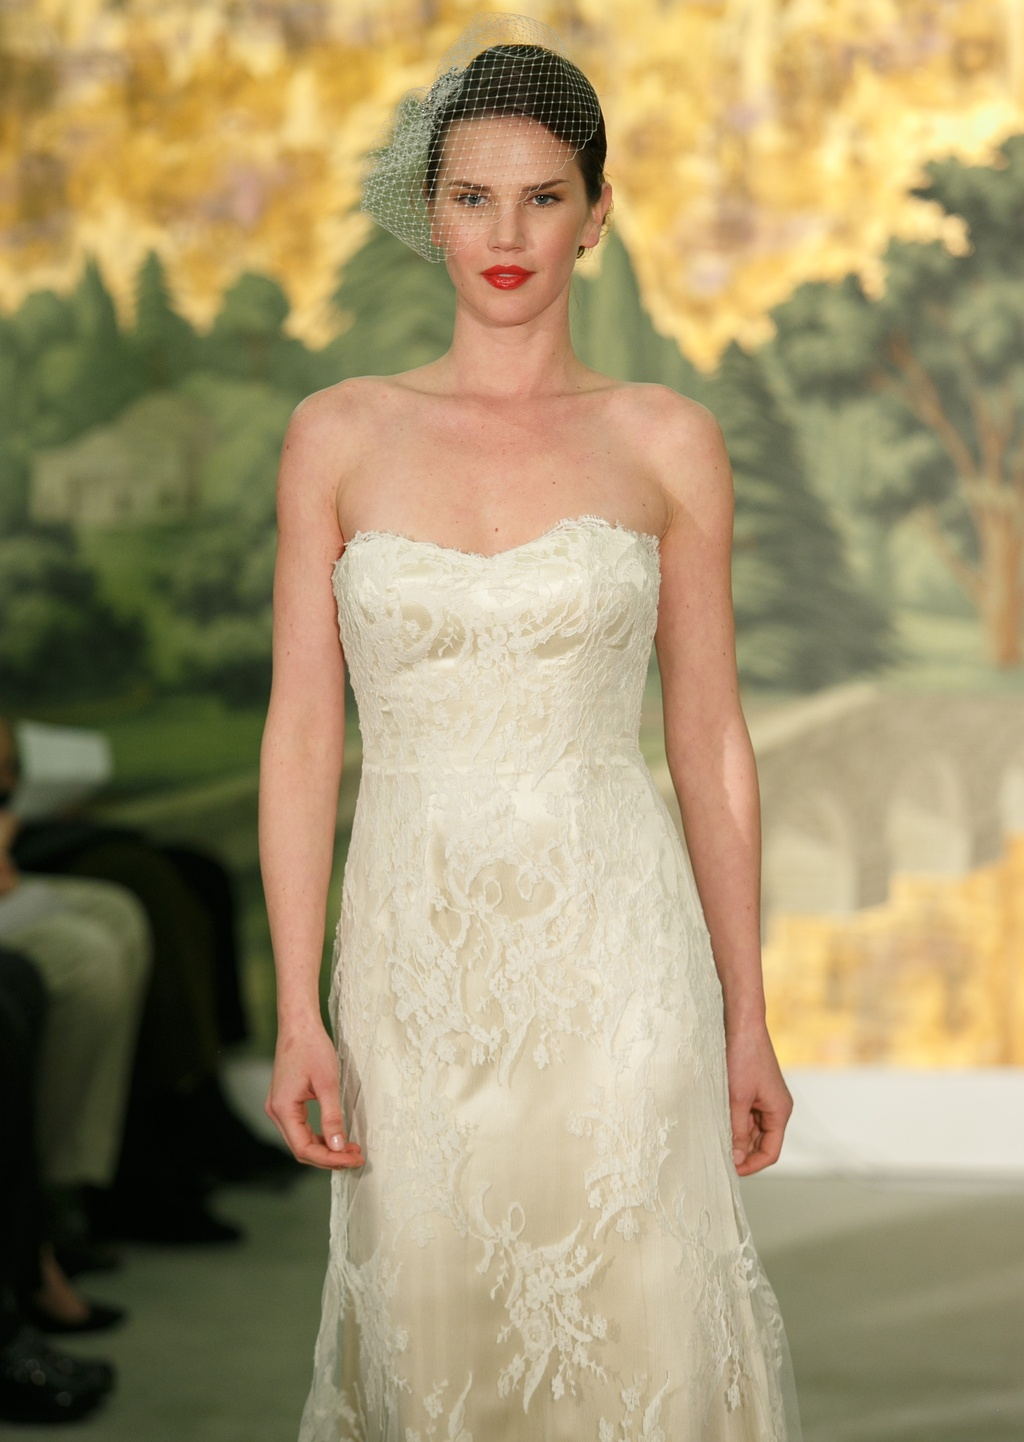 Wedding-dress-by-anne-barge-spring-2014-bridal-narcisse.full